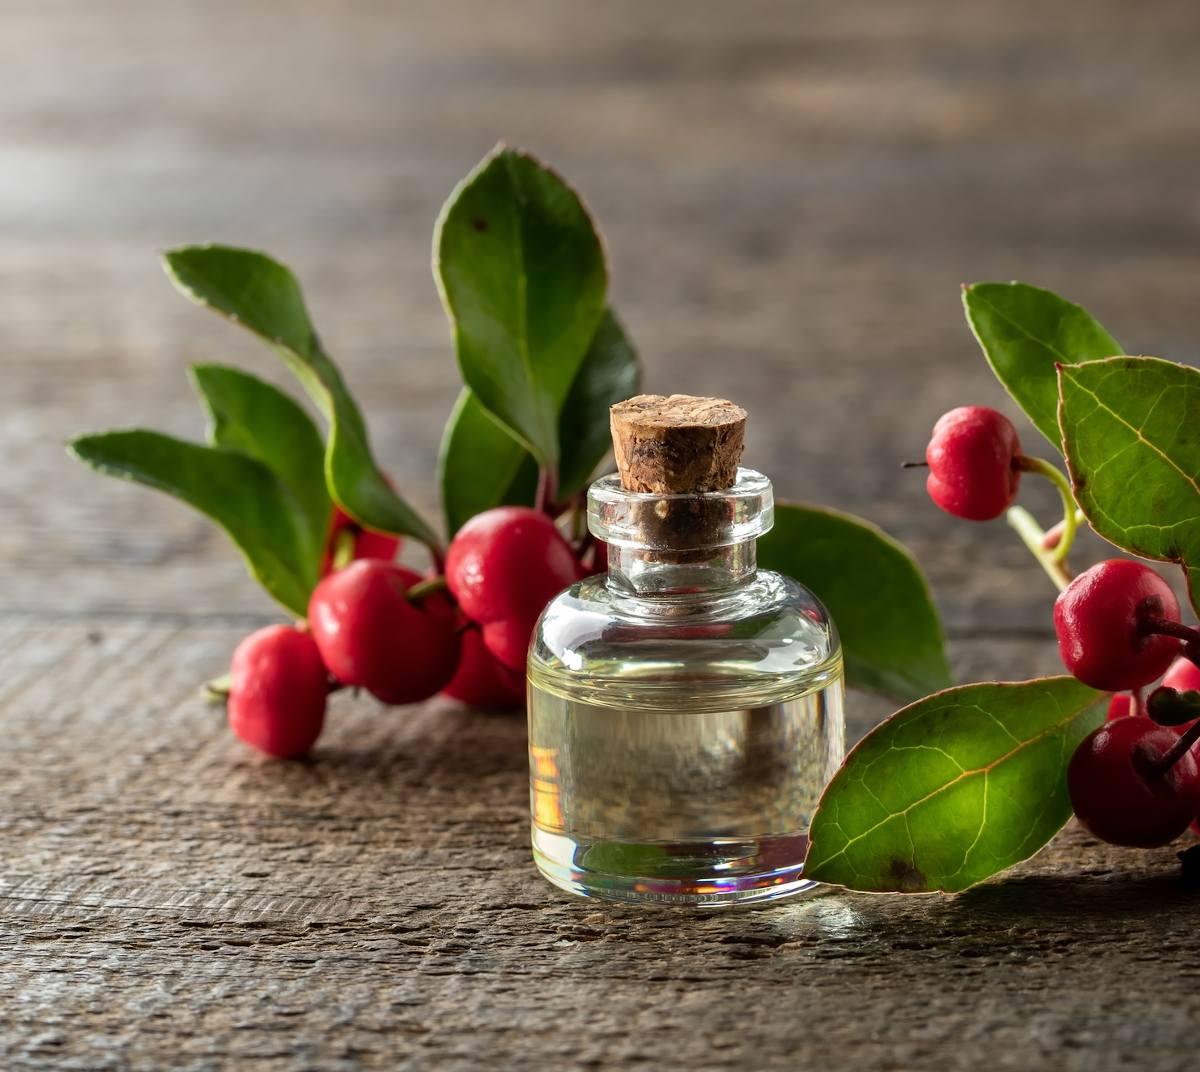 Gaultherie bienfaits anti inflammatoire